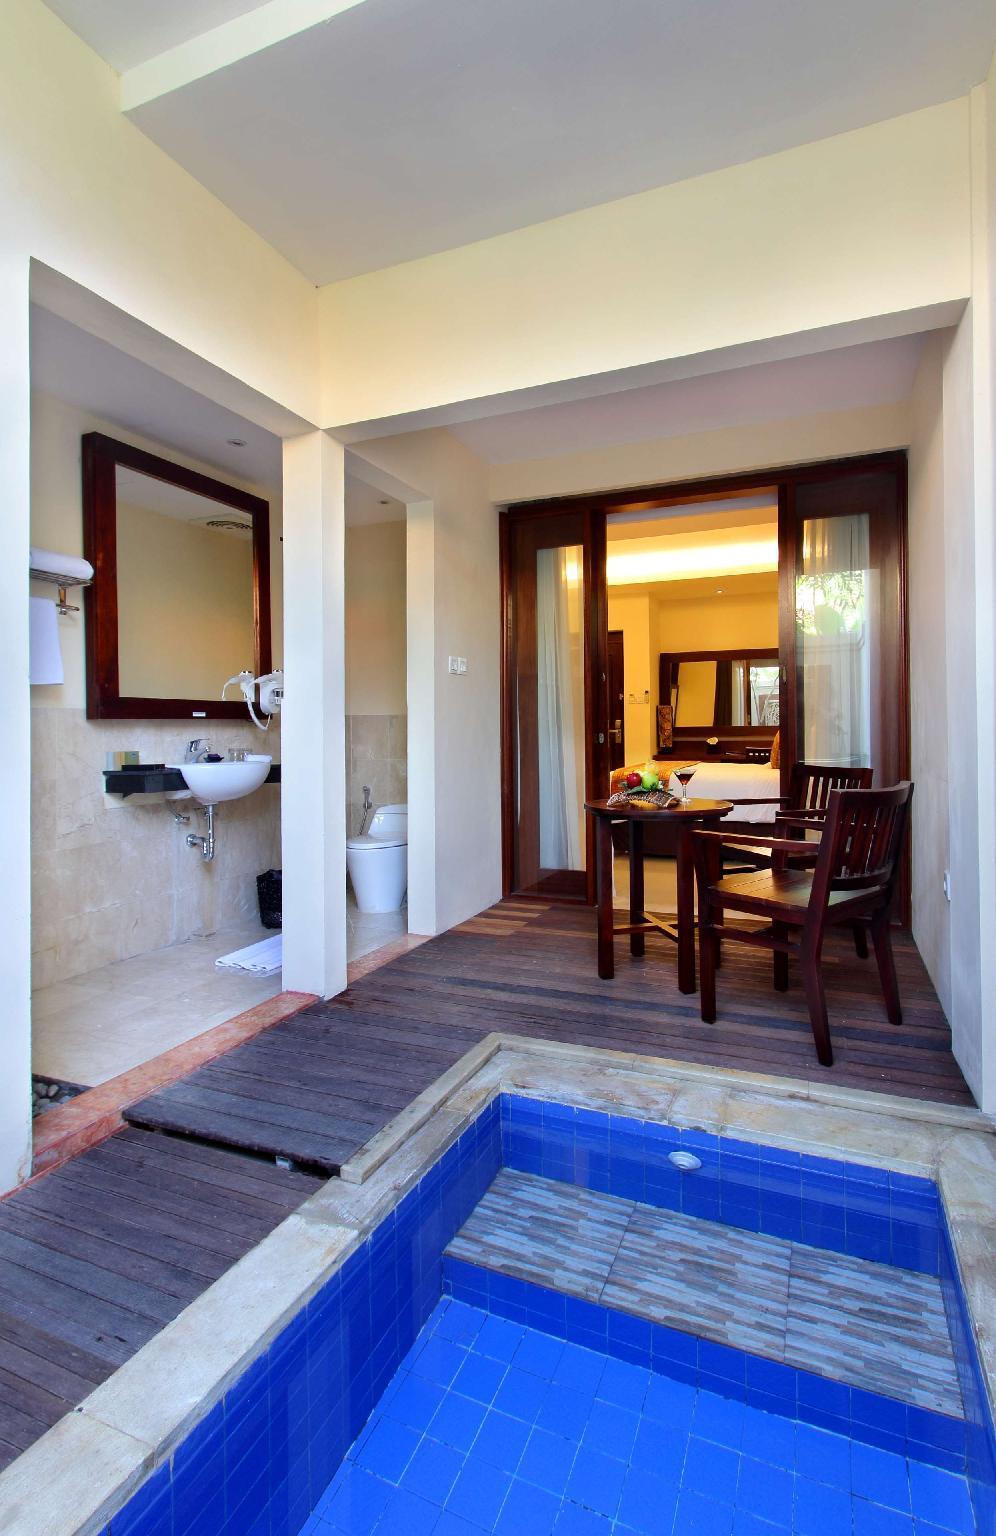 Best Western Kuta Villa Bali Offers Free Cancellation 2021 Price Lists Reviews